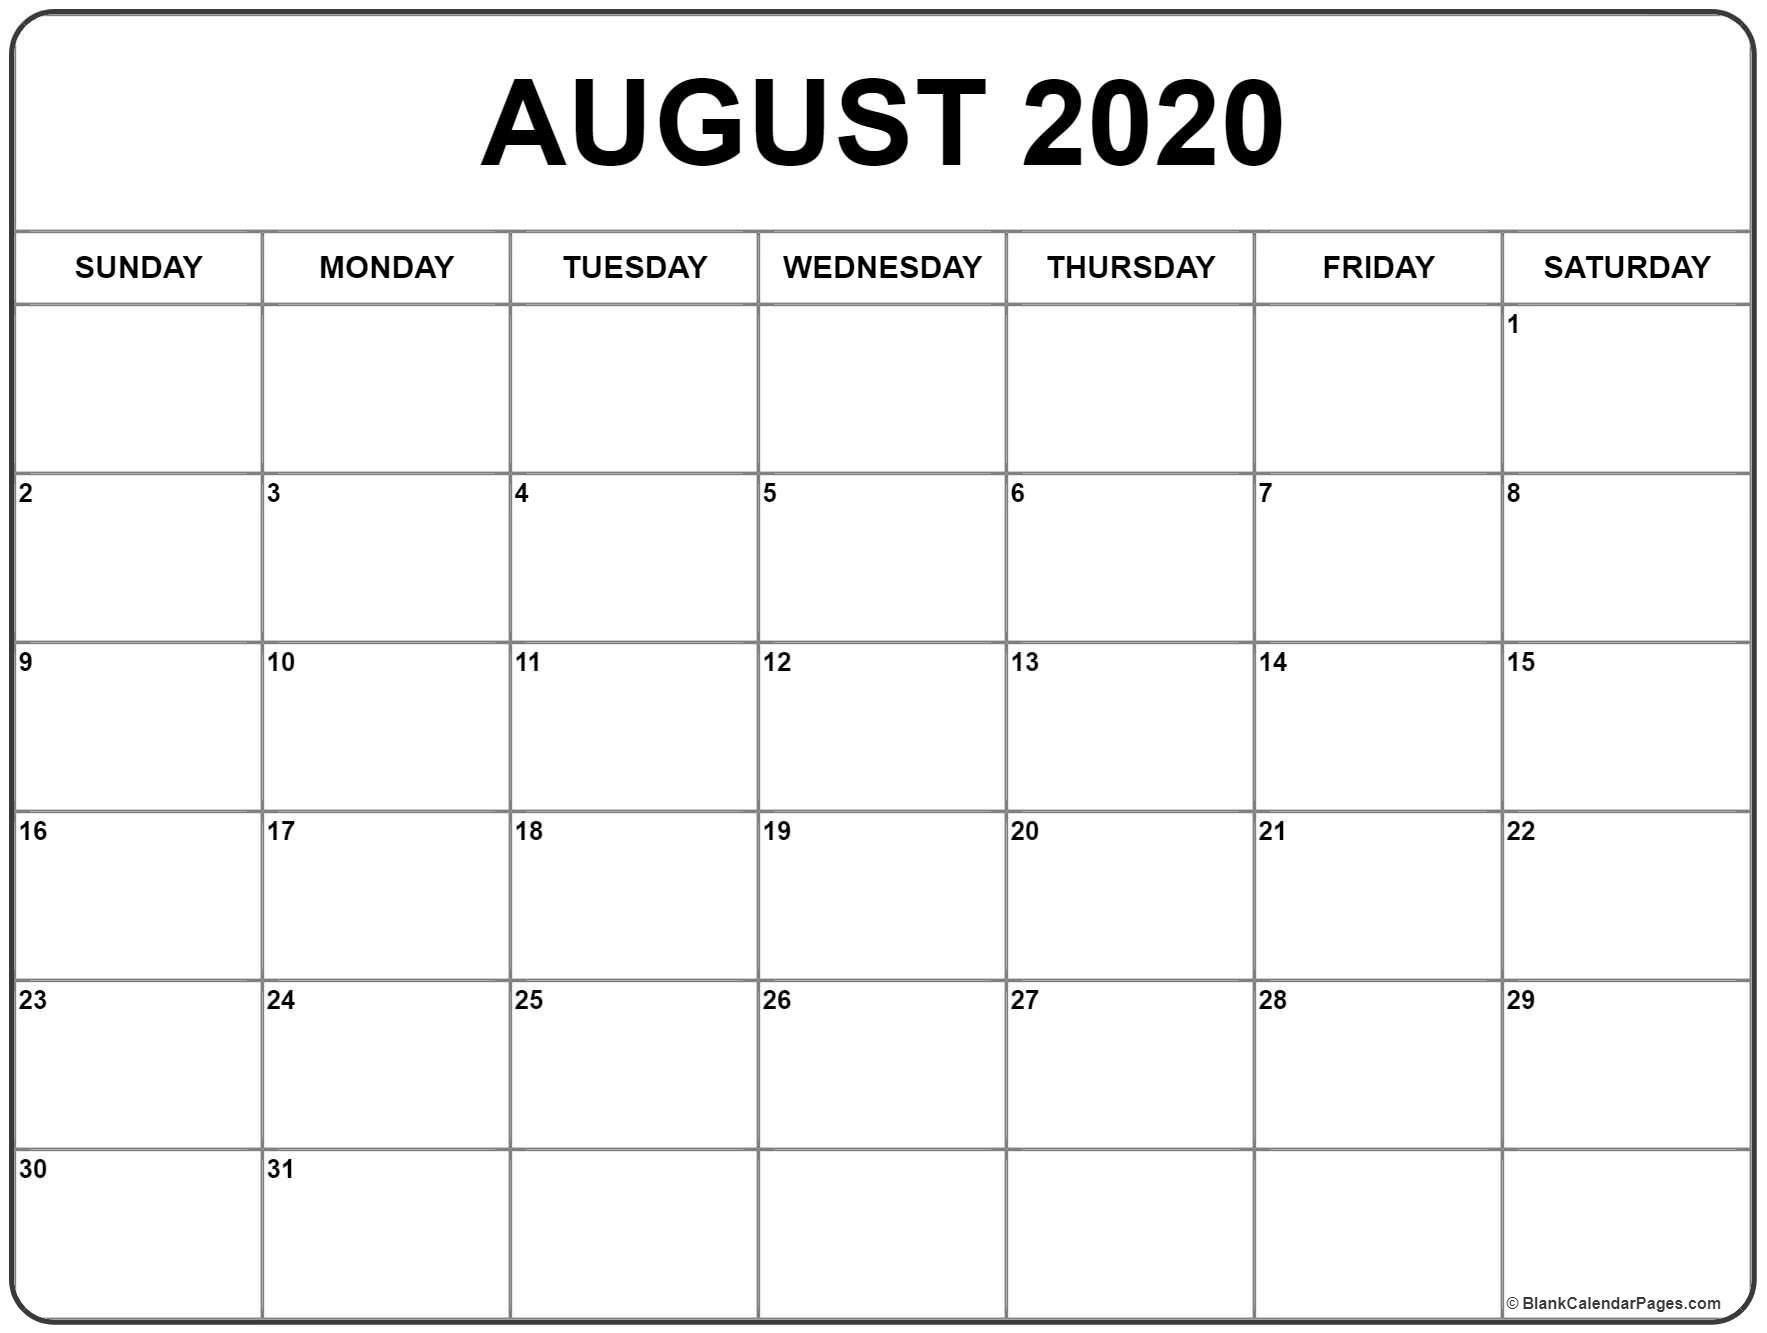 August 2020 Calendar . August 2020 Calendar Printableaugust